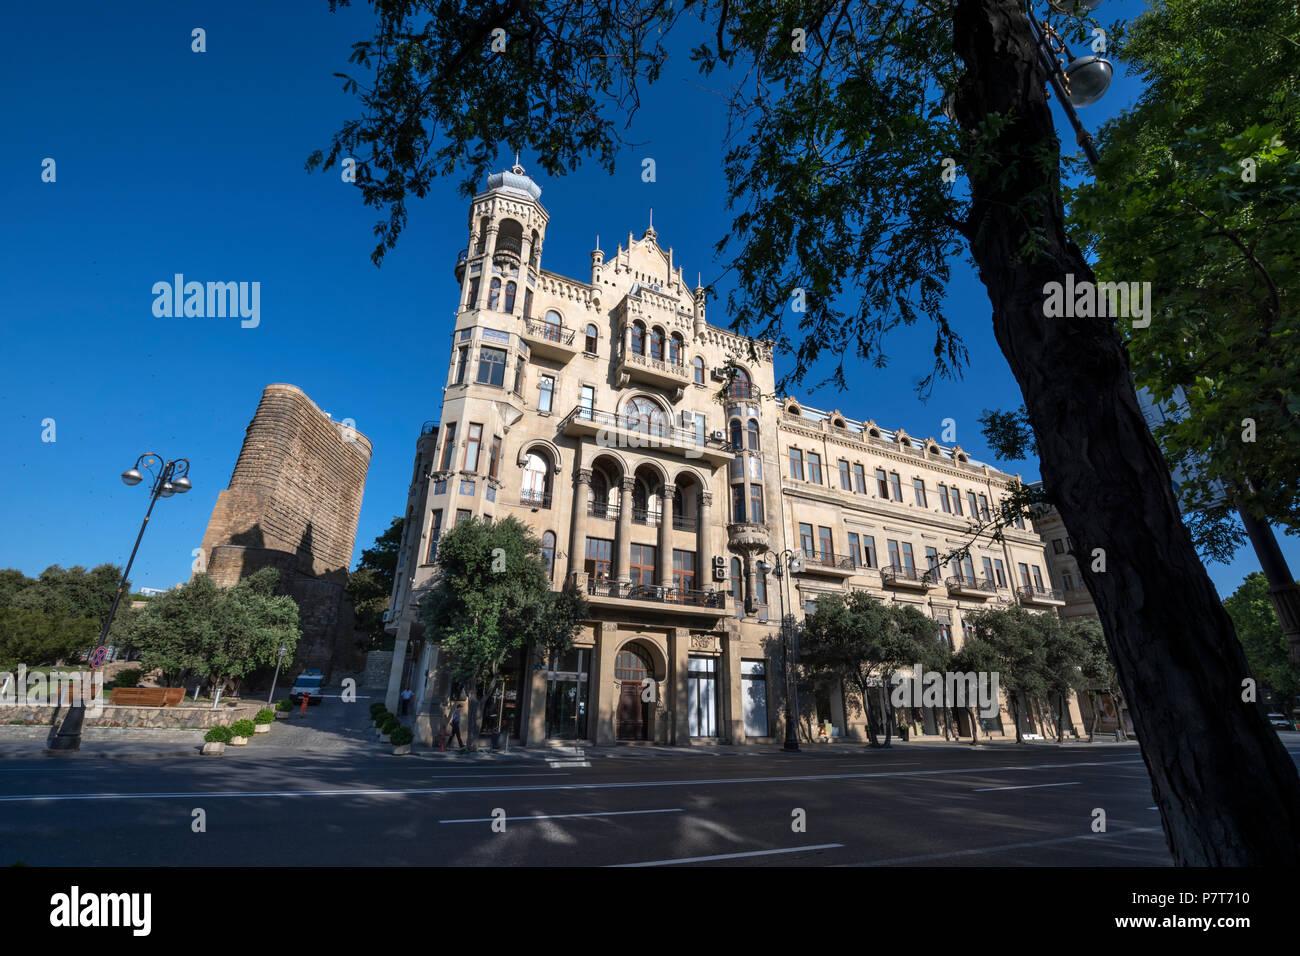 Qiz Galasi, Maiden's Tower in the Icheri Sheher( Ichari Shahar)of Baku, Azerbaijan - Stock Image